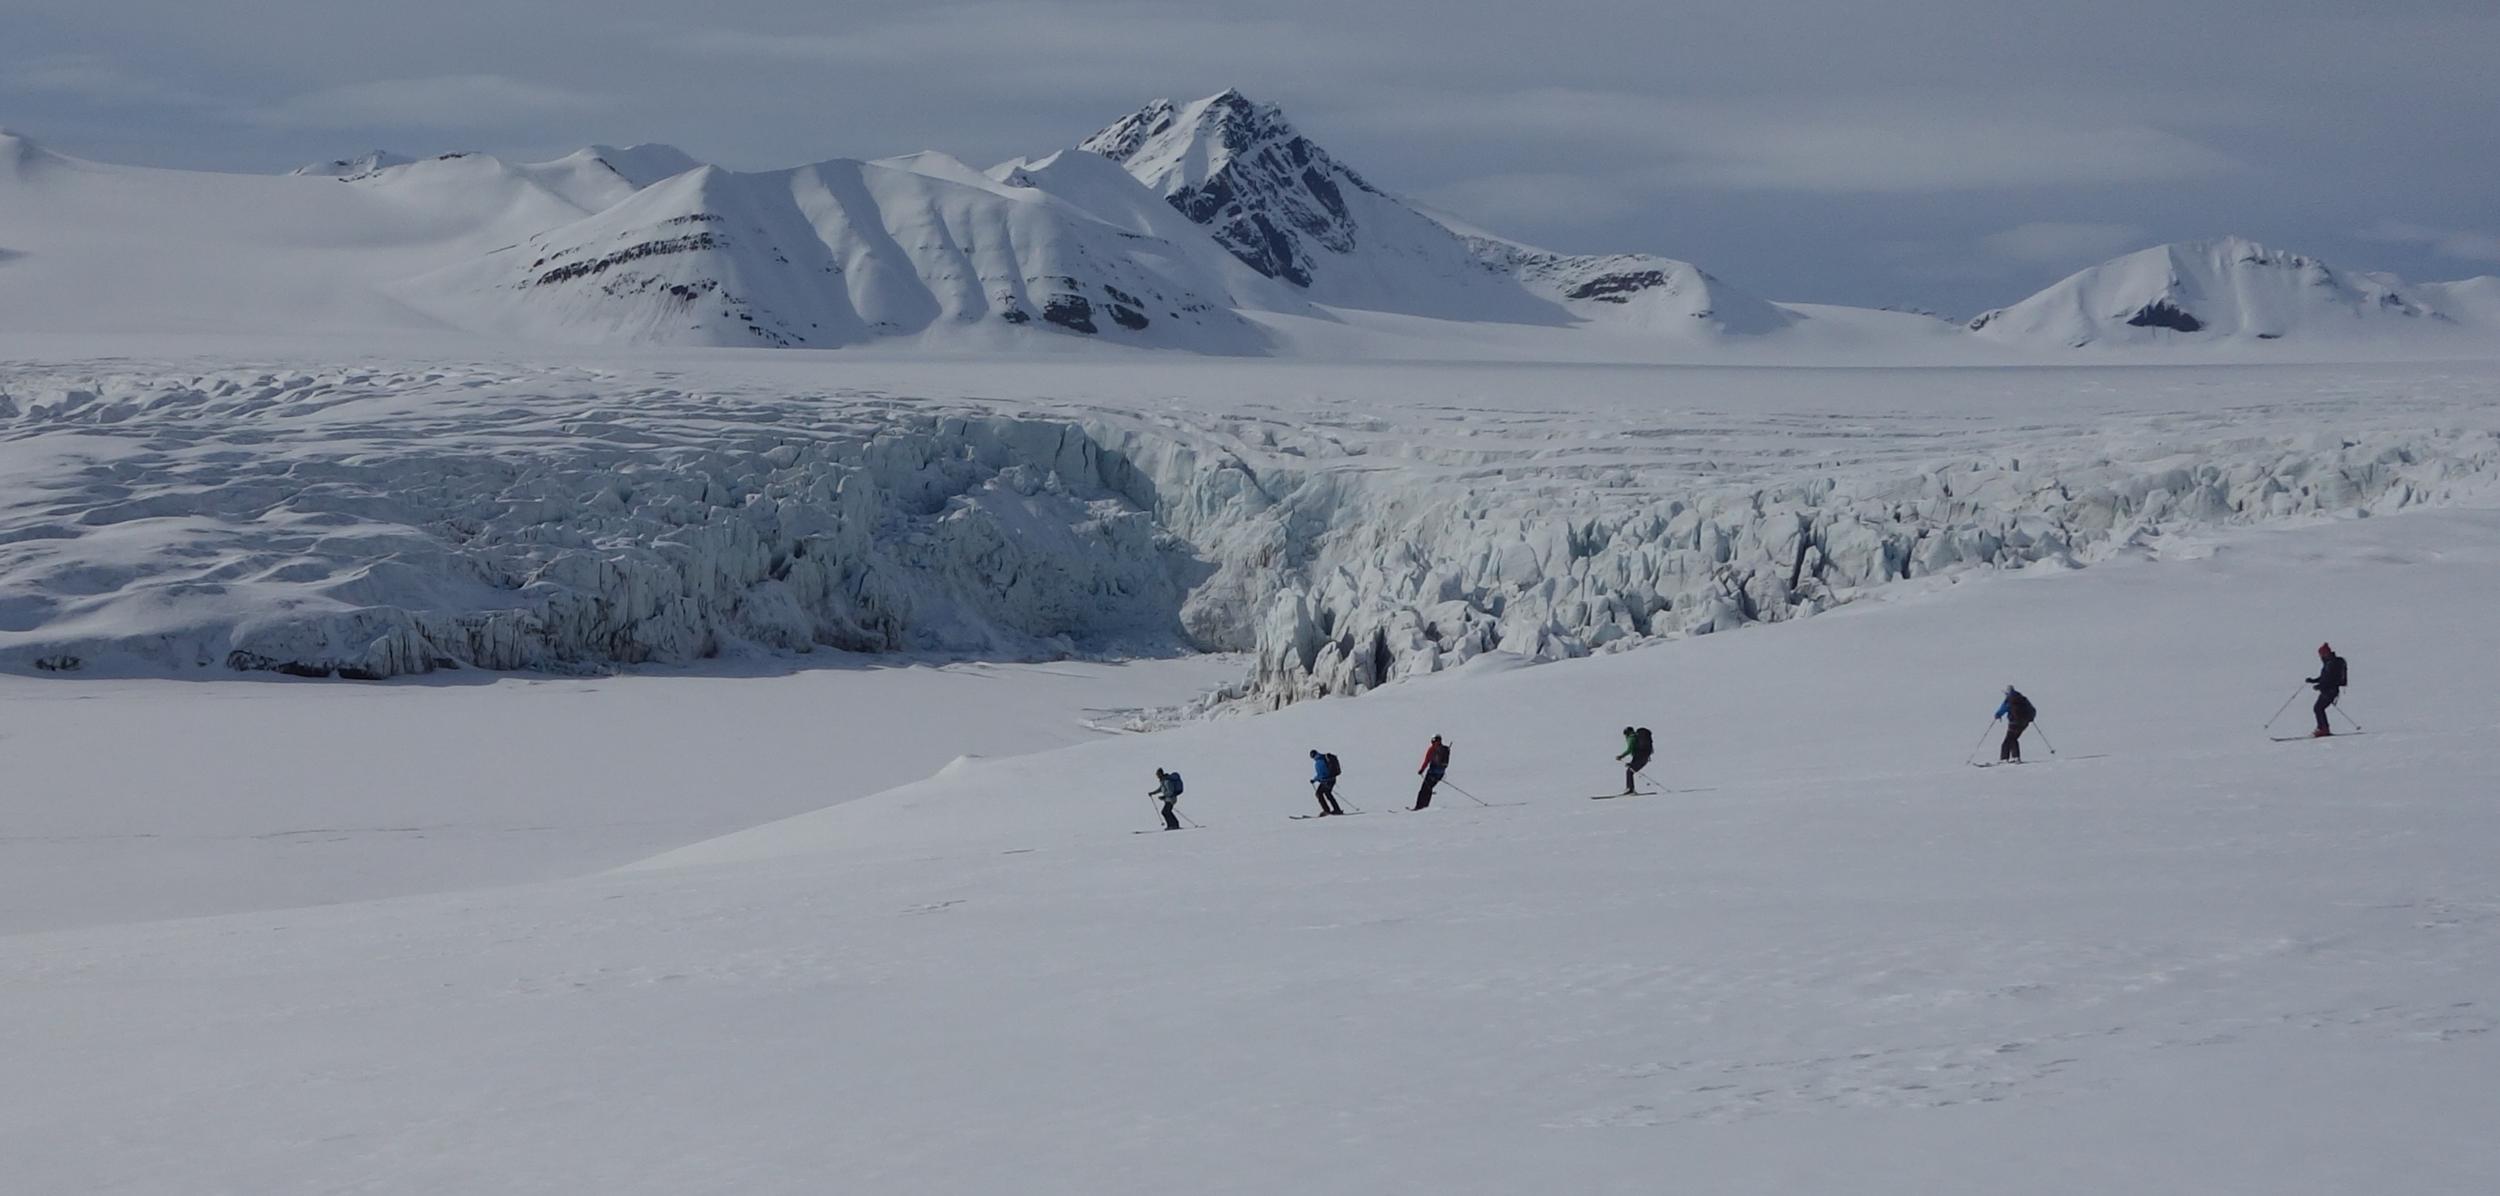 Nino skiing seracs background.PNG